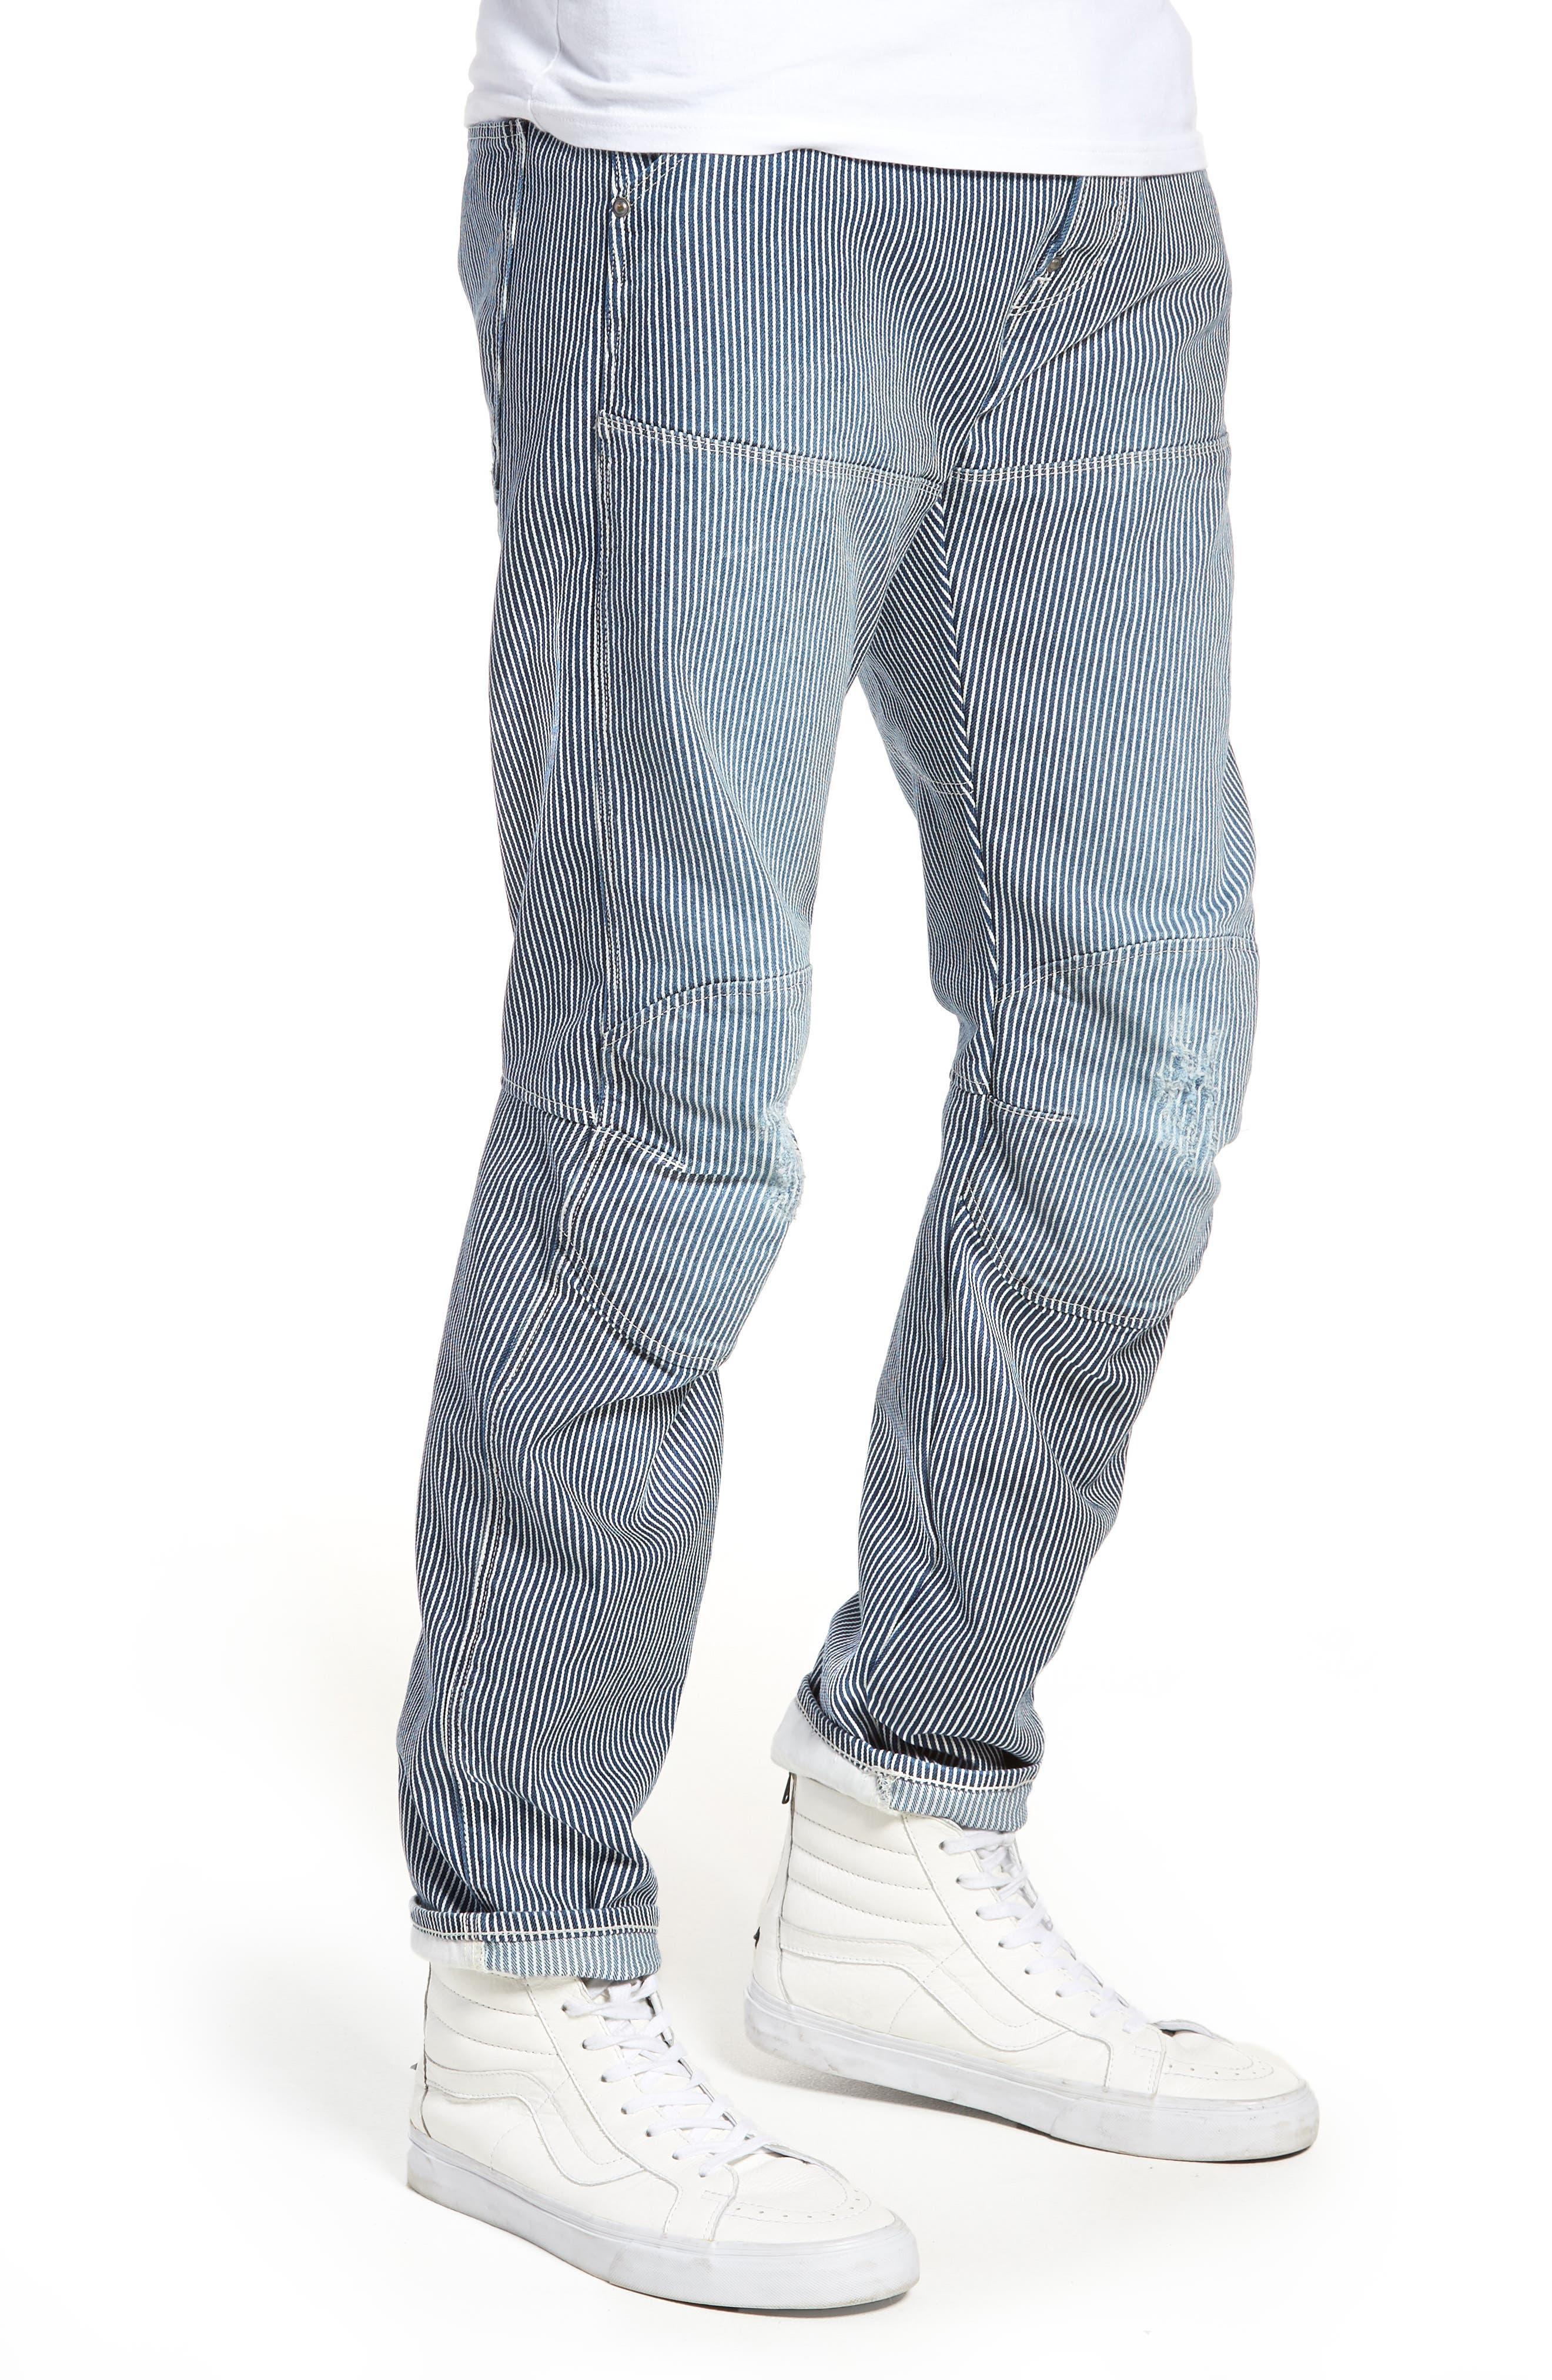 3D Slim Pants,                             Alternate thumbnail 3, color,                             Medium Aged Destroy